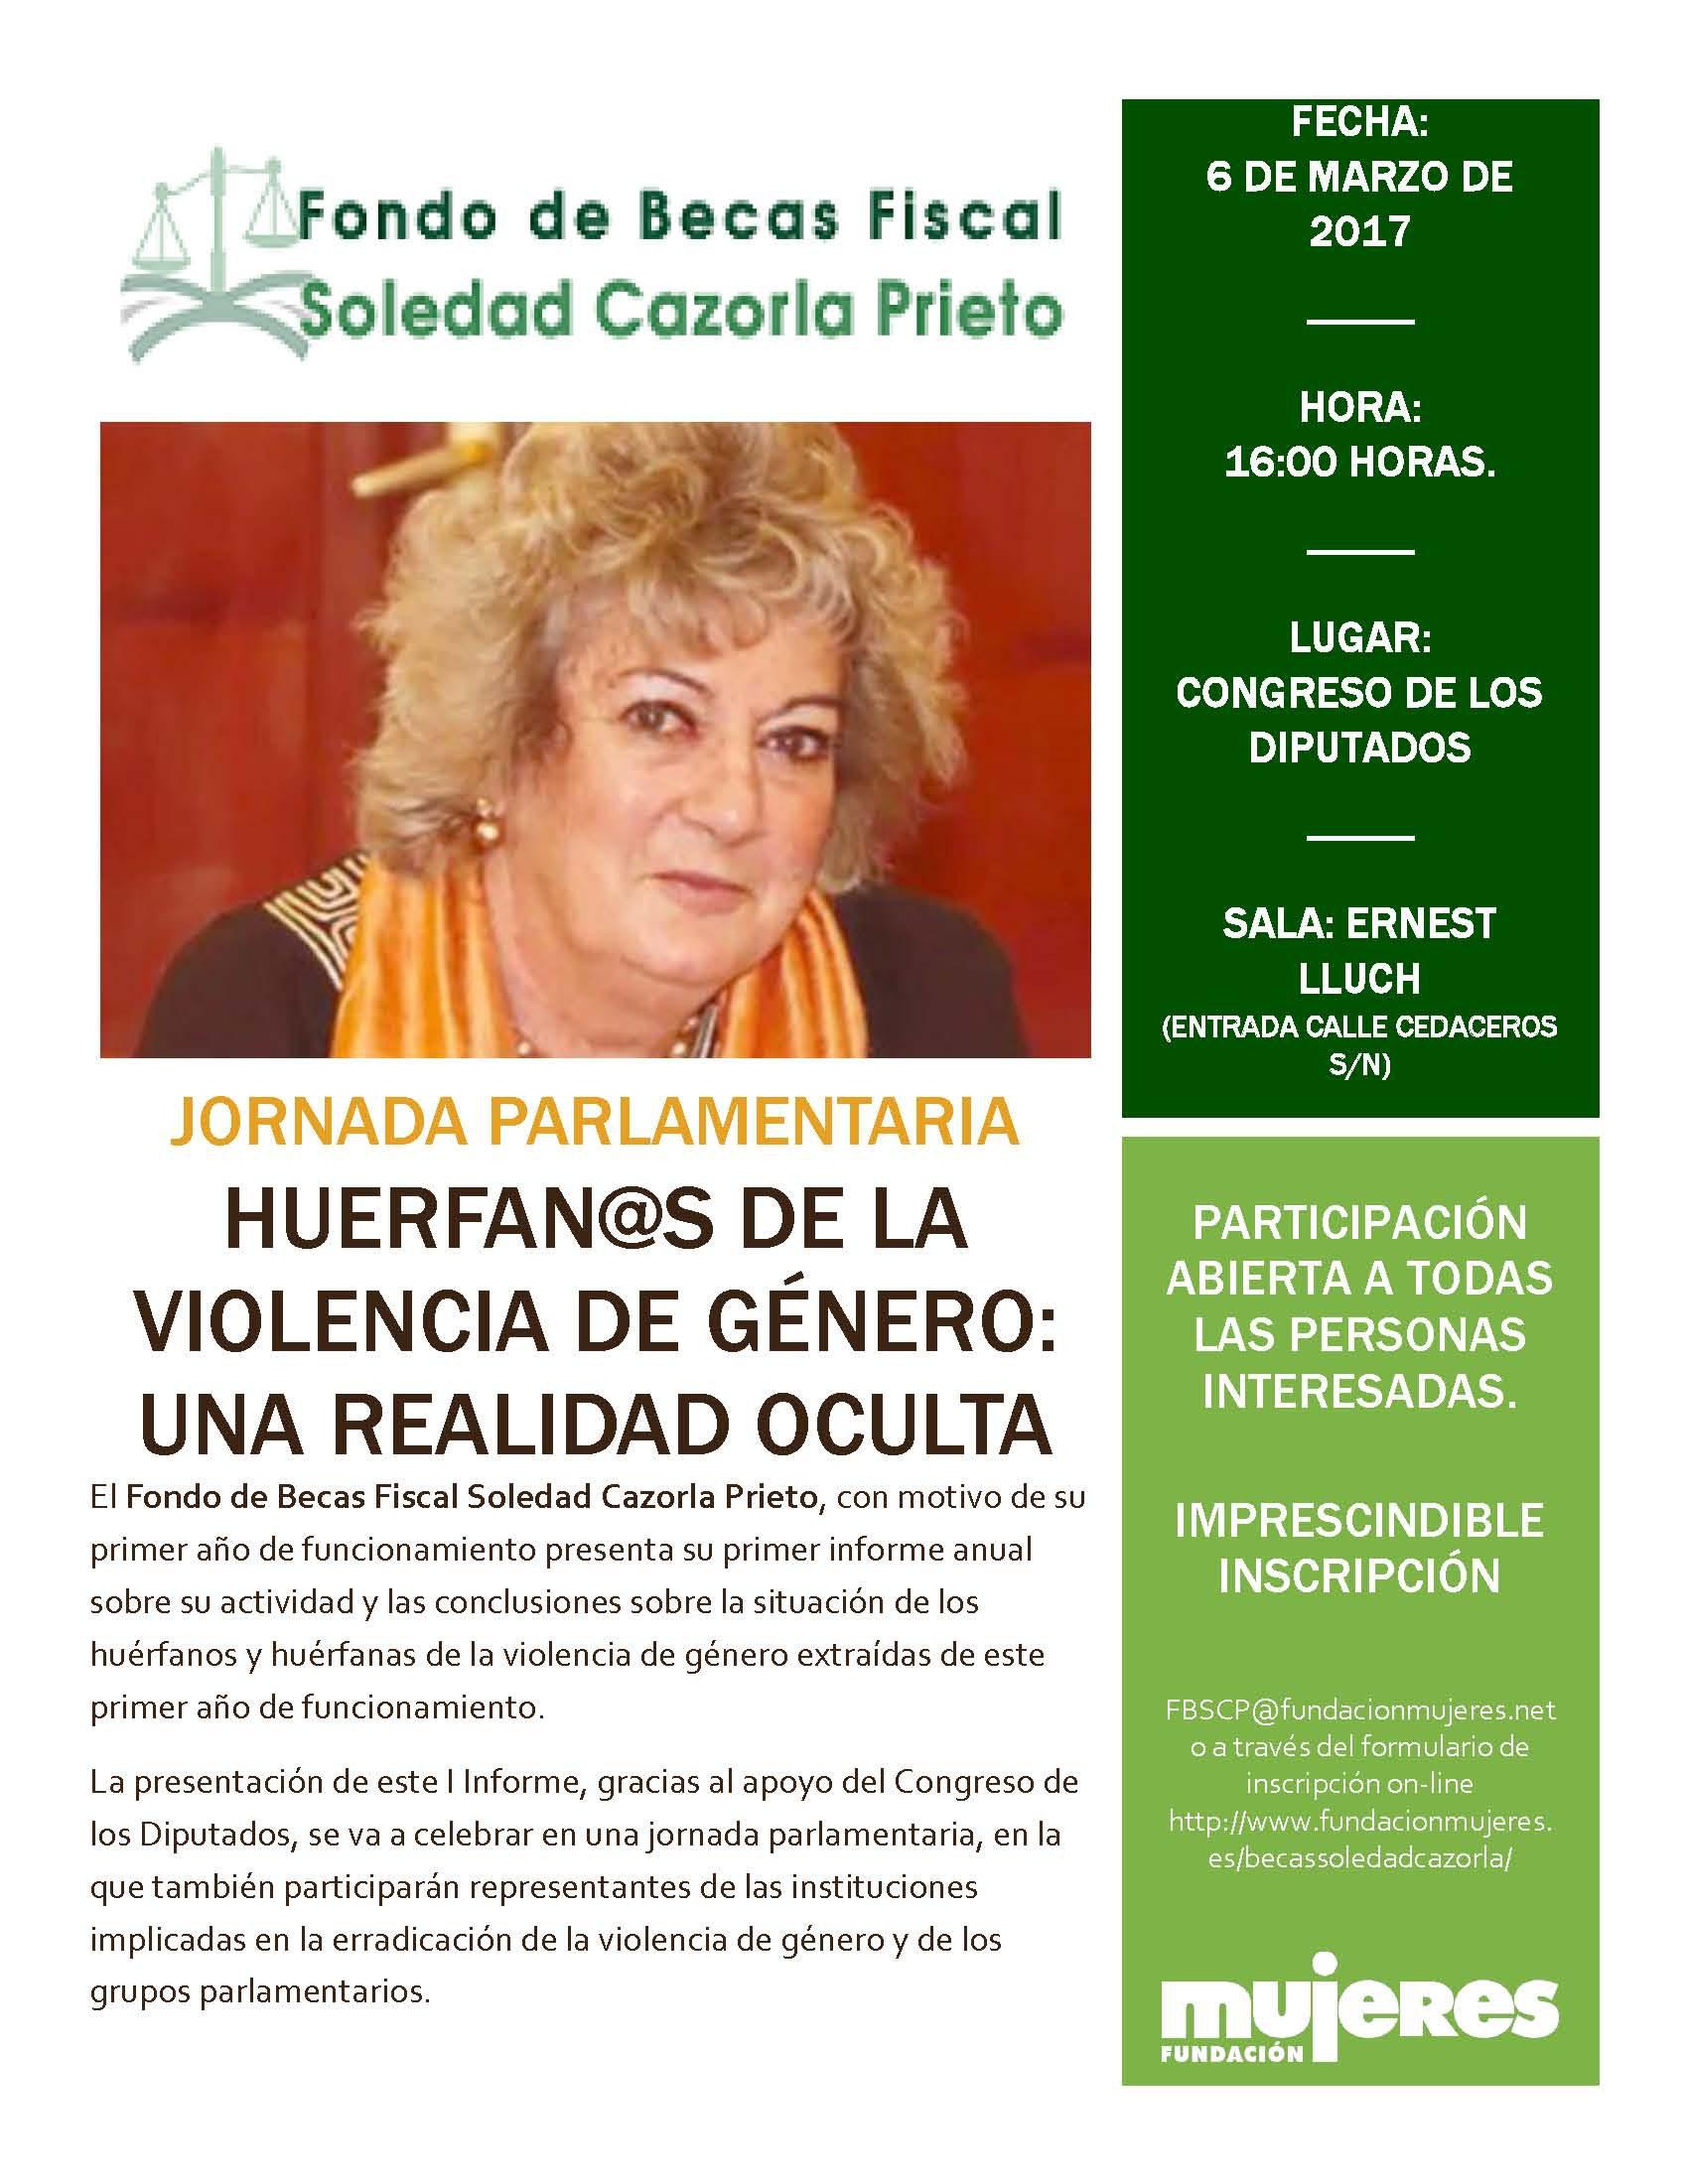 Jornada Parlamentaria_imagen_noticia